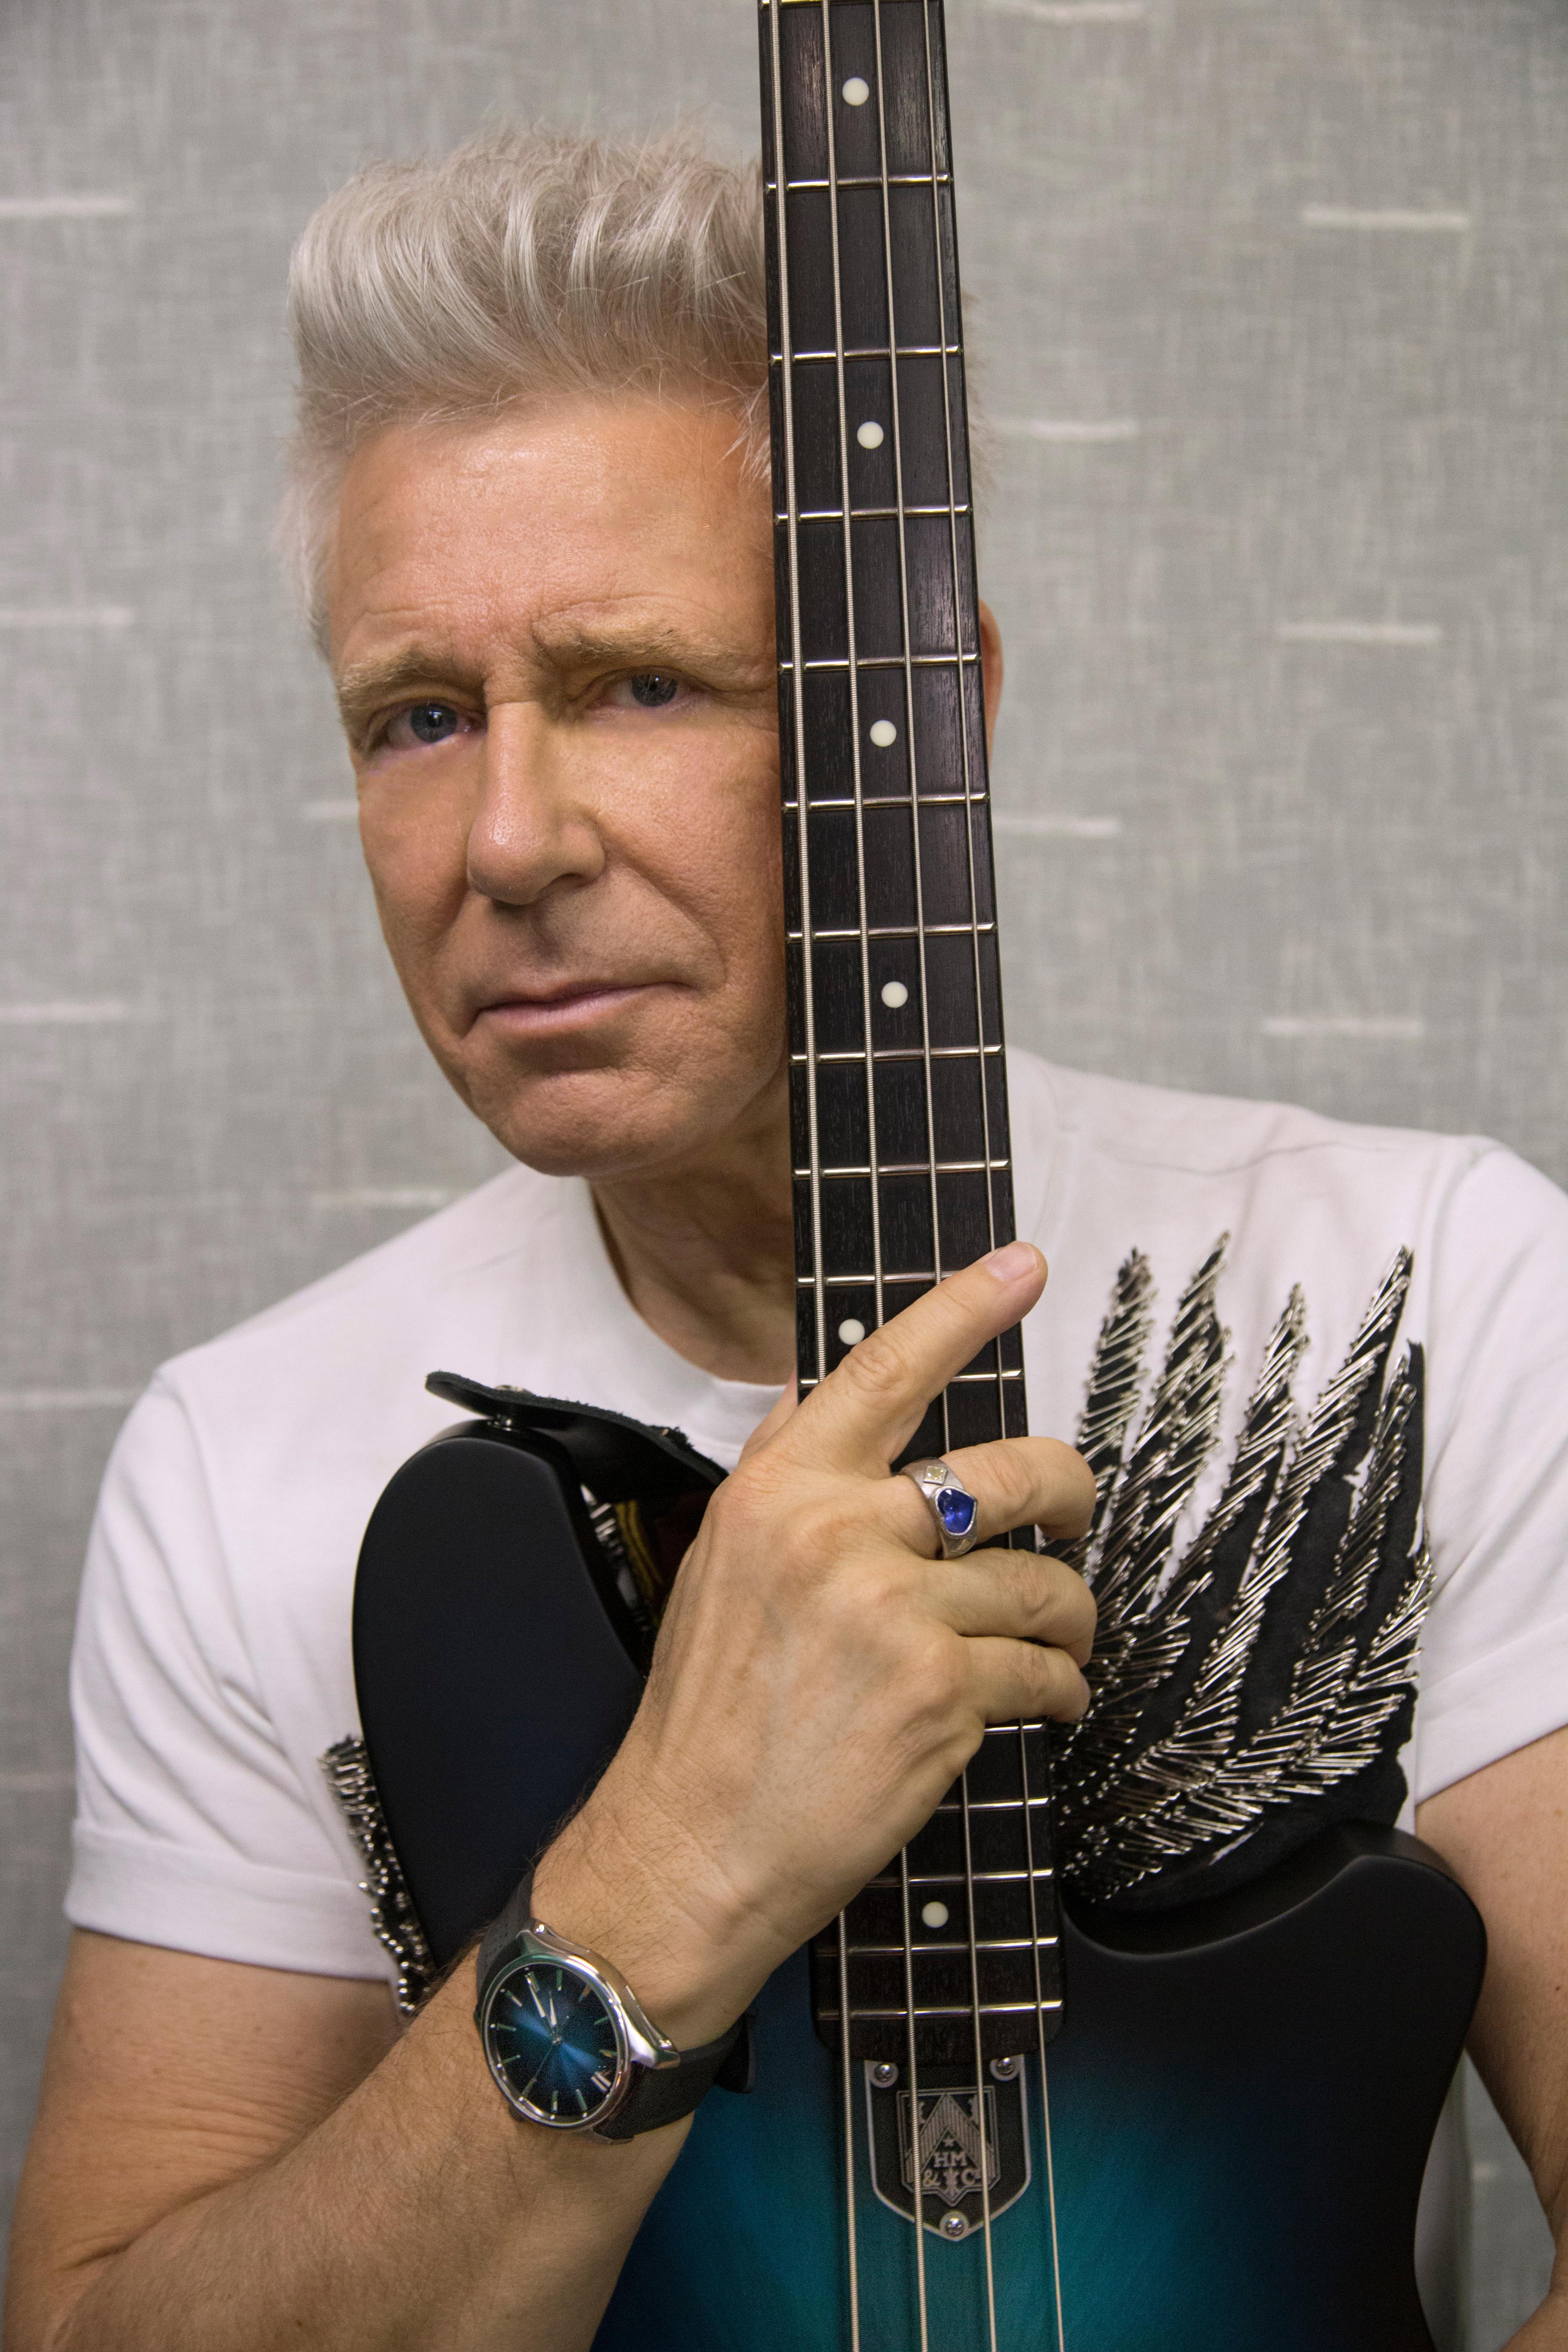 U2 bass player Adam Clayton's H. Moser & Cie Pioneer Centre Seconds